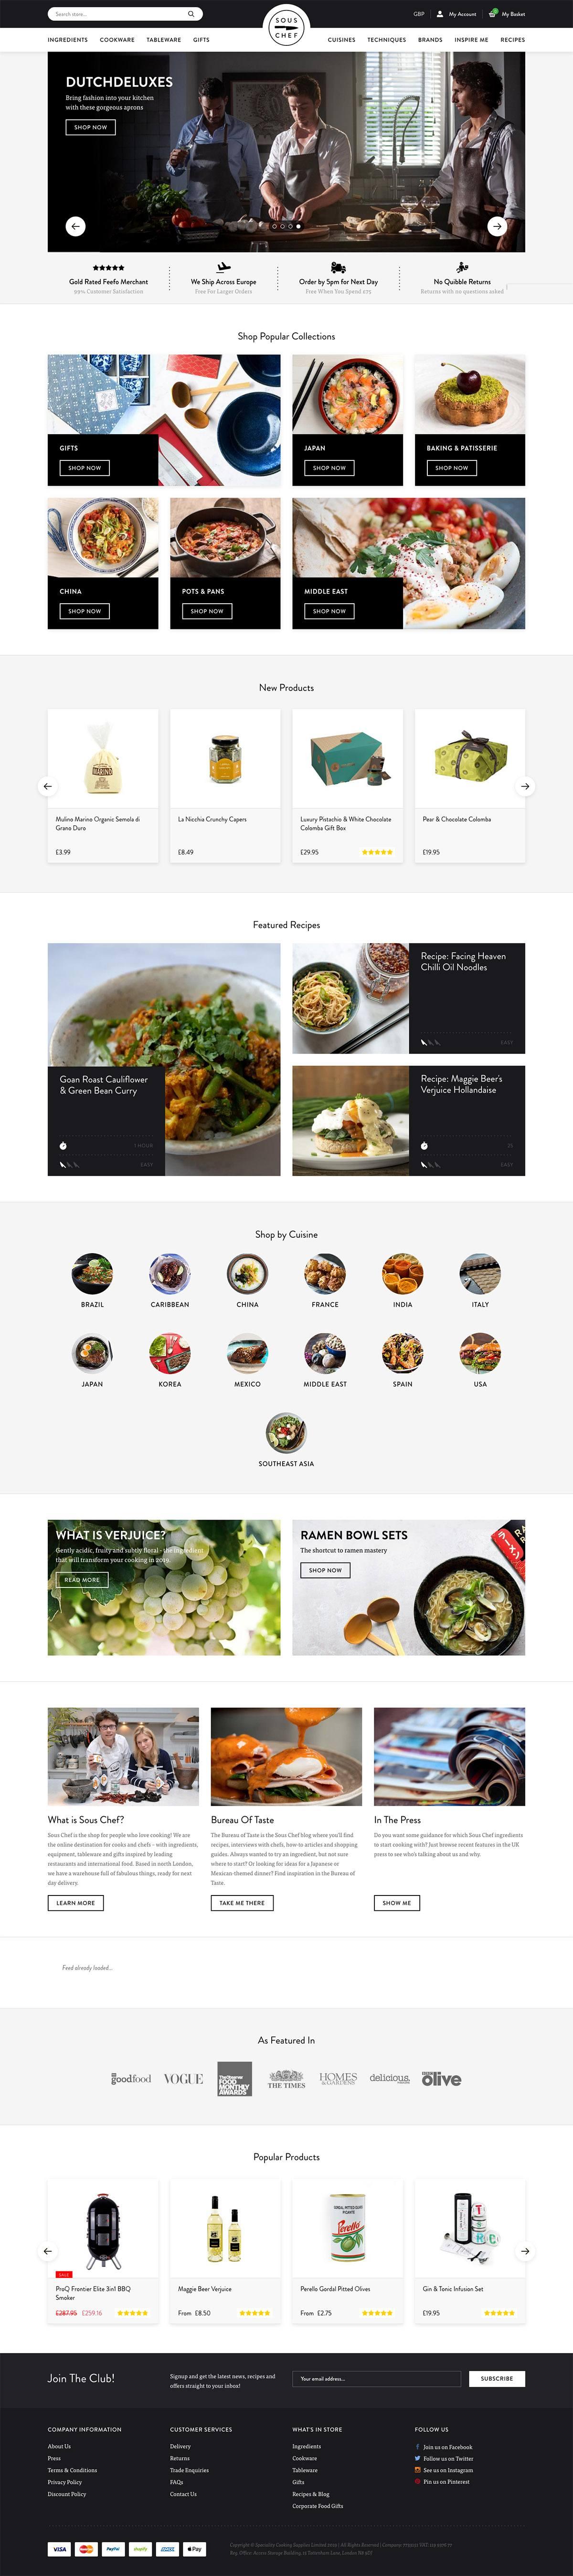 eCommerce website: Sous Chef